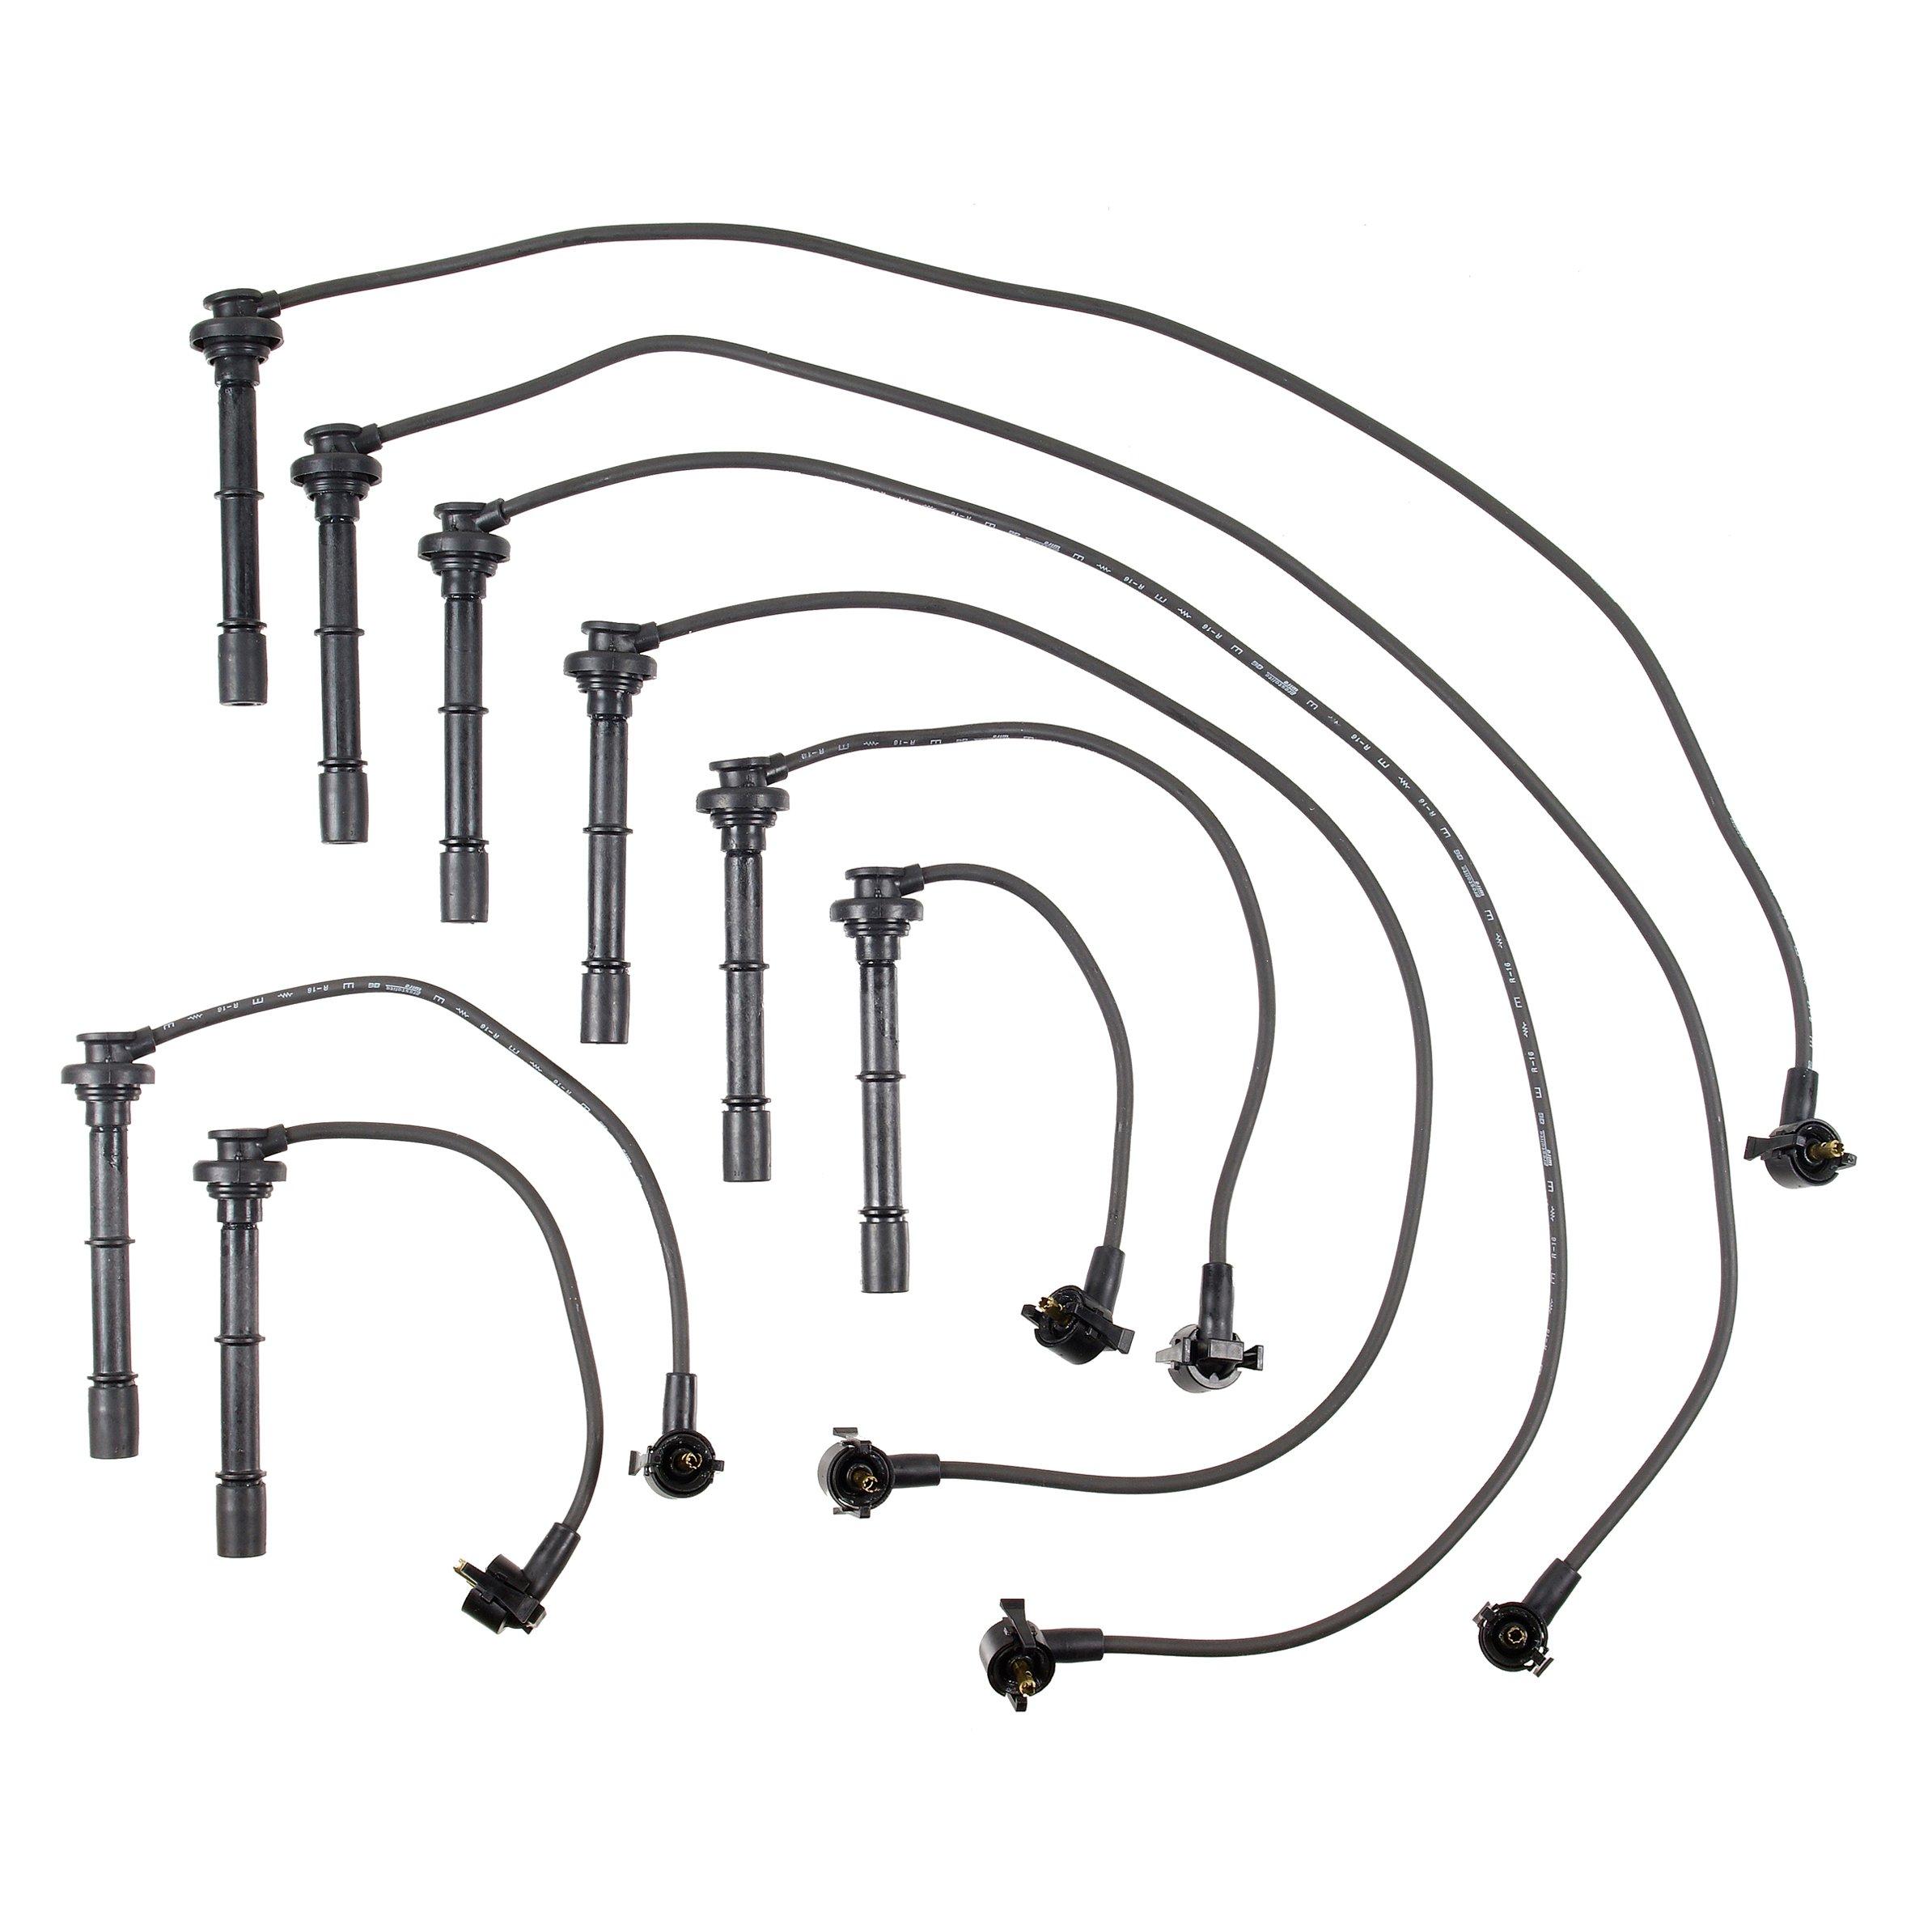 proconnect 128019 spark plug wire set